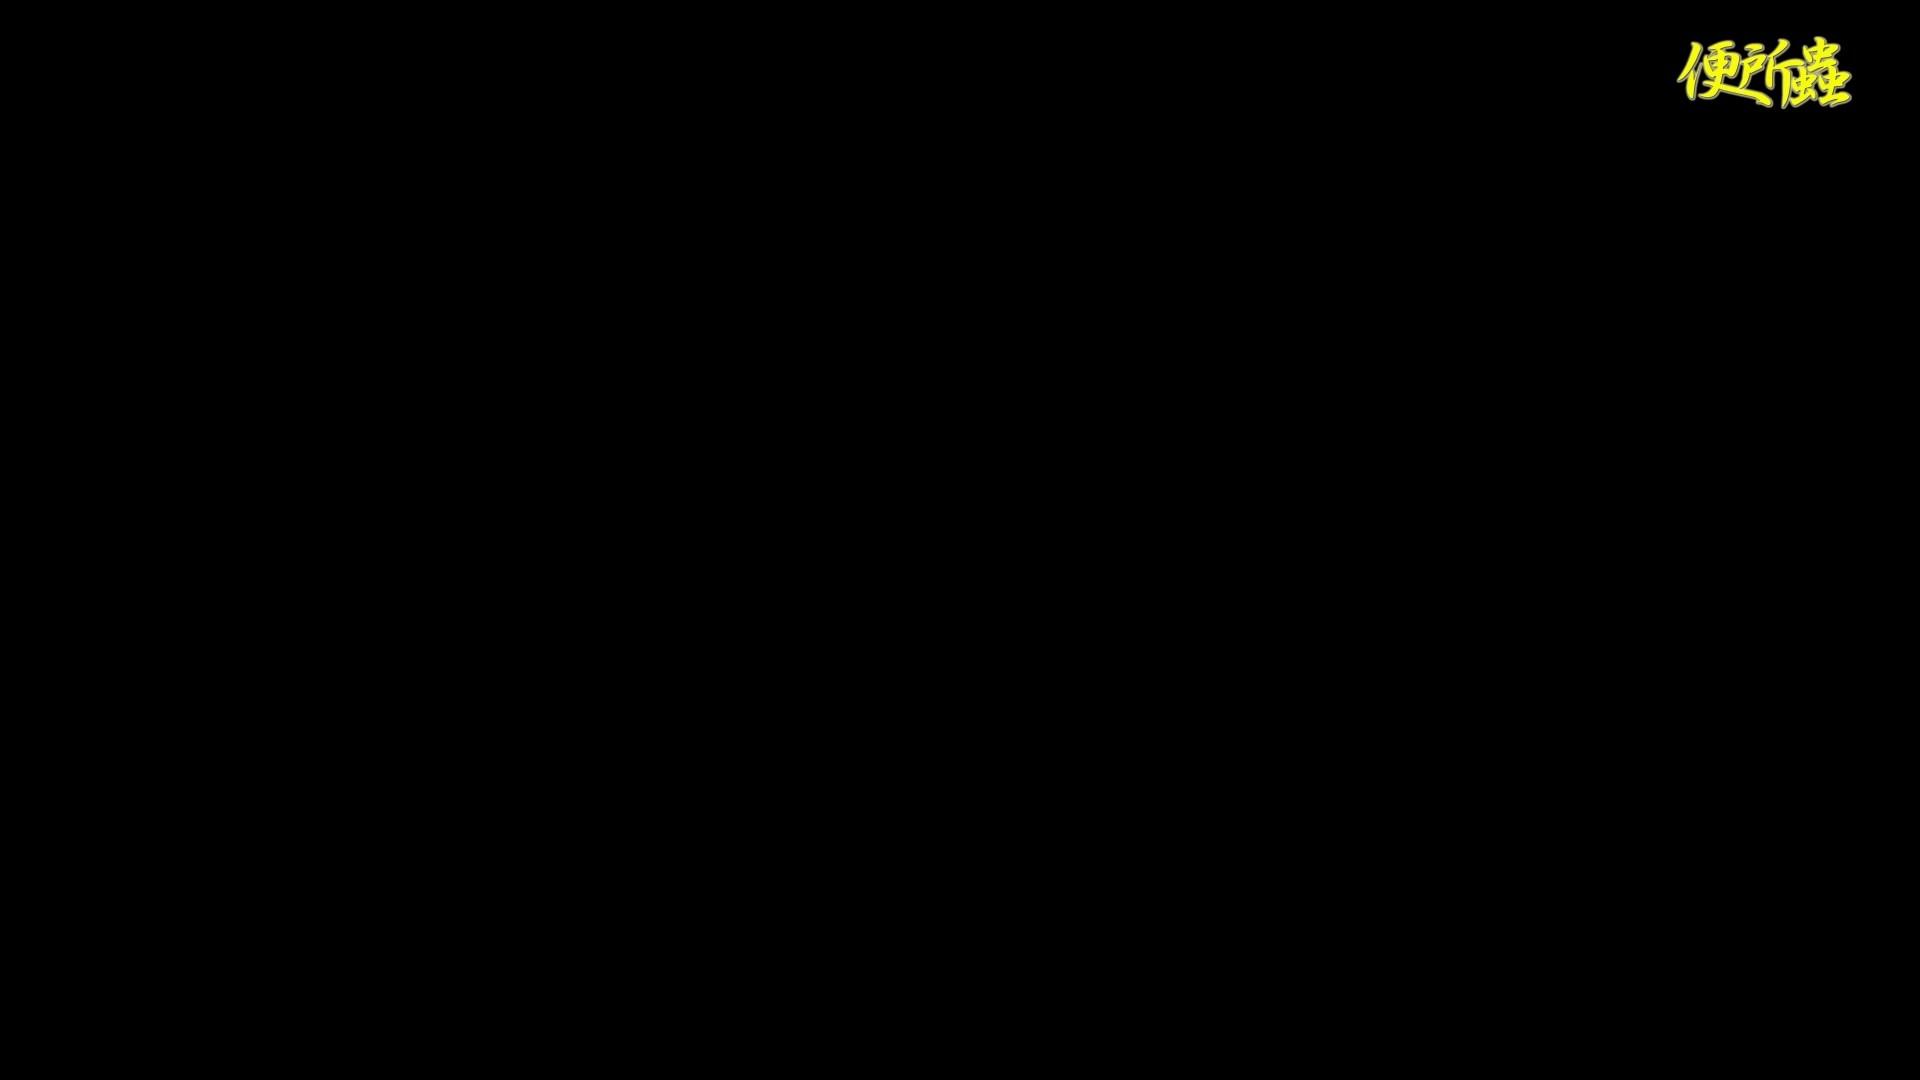 vol.01 便所蟲さんのリターン~便所蟲2匹目~ 丸見え AV動画キャプチャ 106画像 42